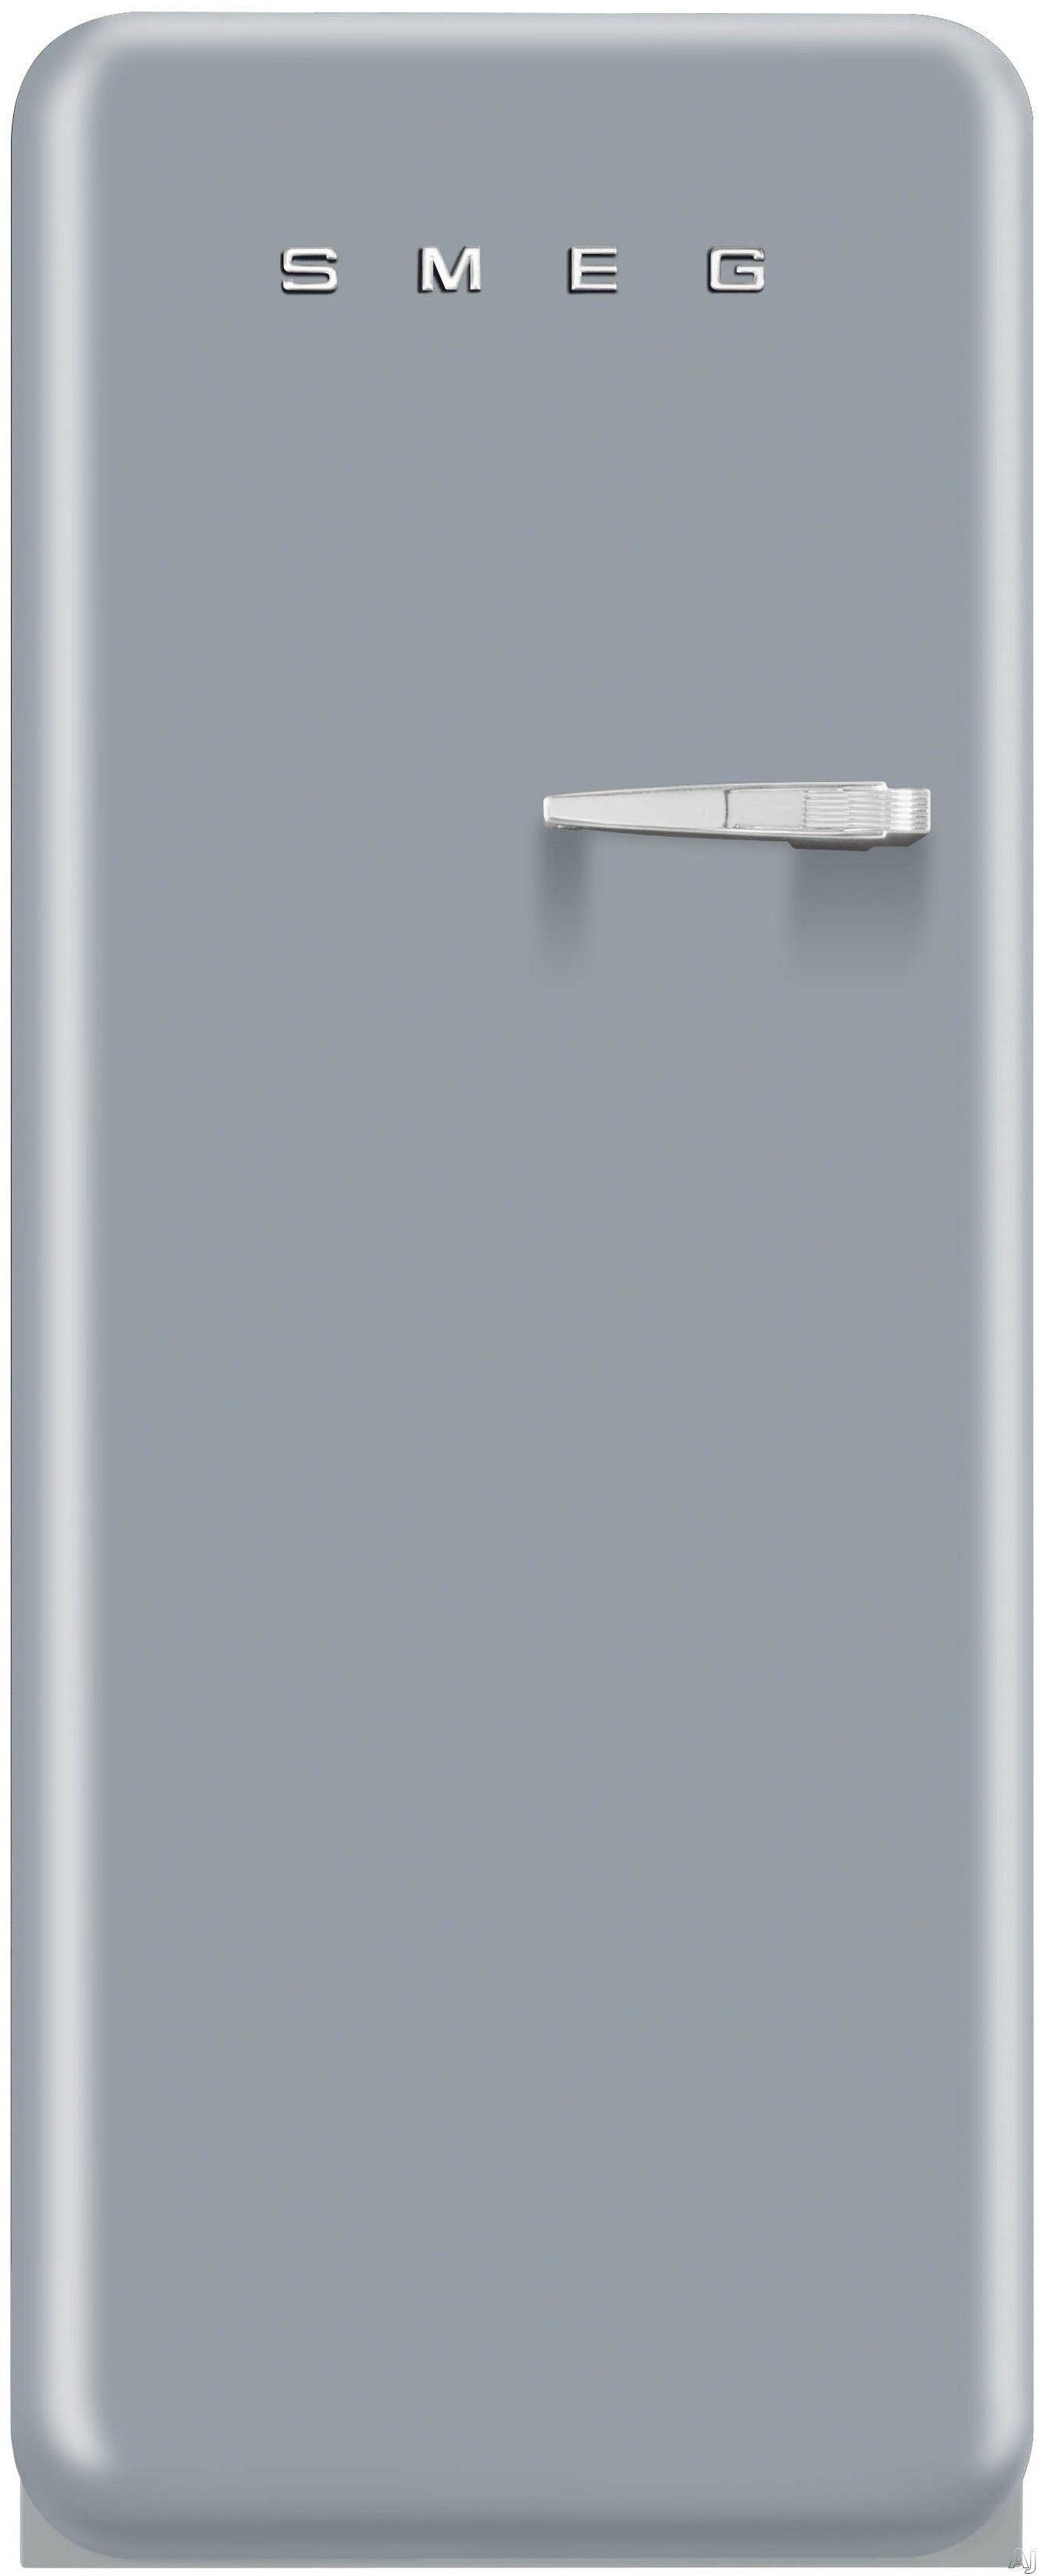 Smeg FAB28USVL1 9.22 cu. ft. 50's Style Refrigerator with Adjustable Glass Shelves, Wine Bottle Shelf, Crisper Drawer, Adjustable Door Bins, Manual Defrost and Freezer Compartment: Silver, Left Hinge Door Swing